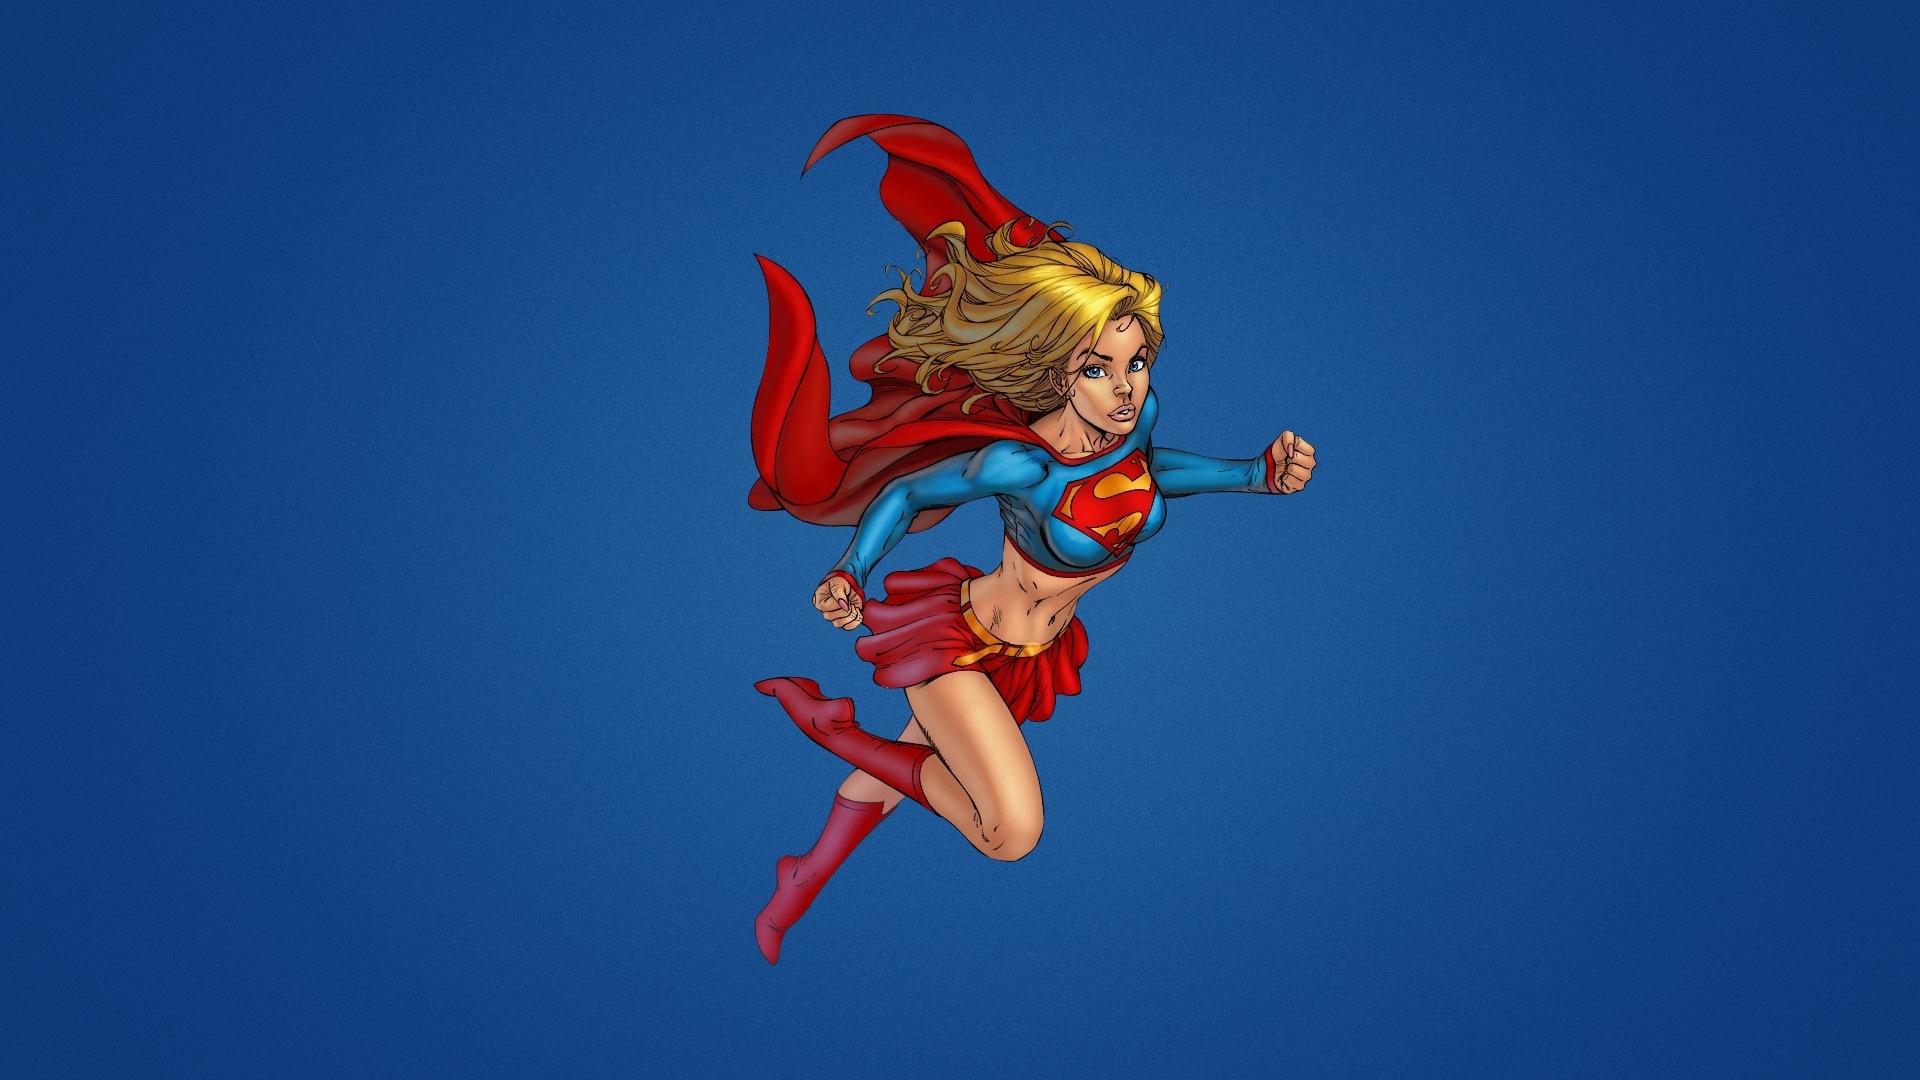 Supergirl cool background